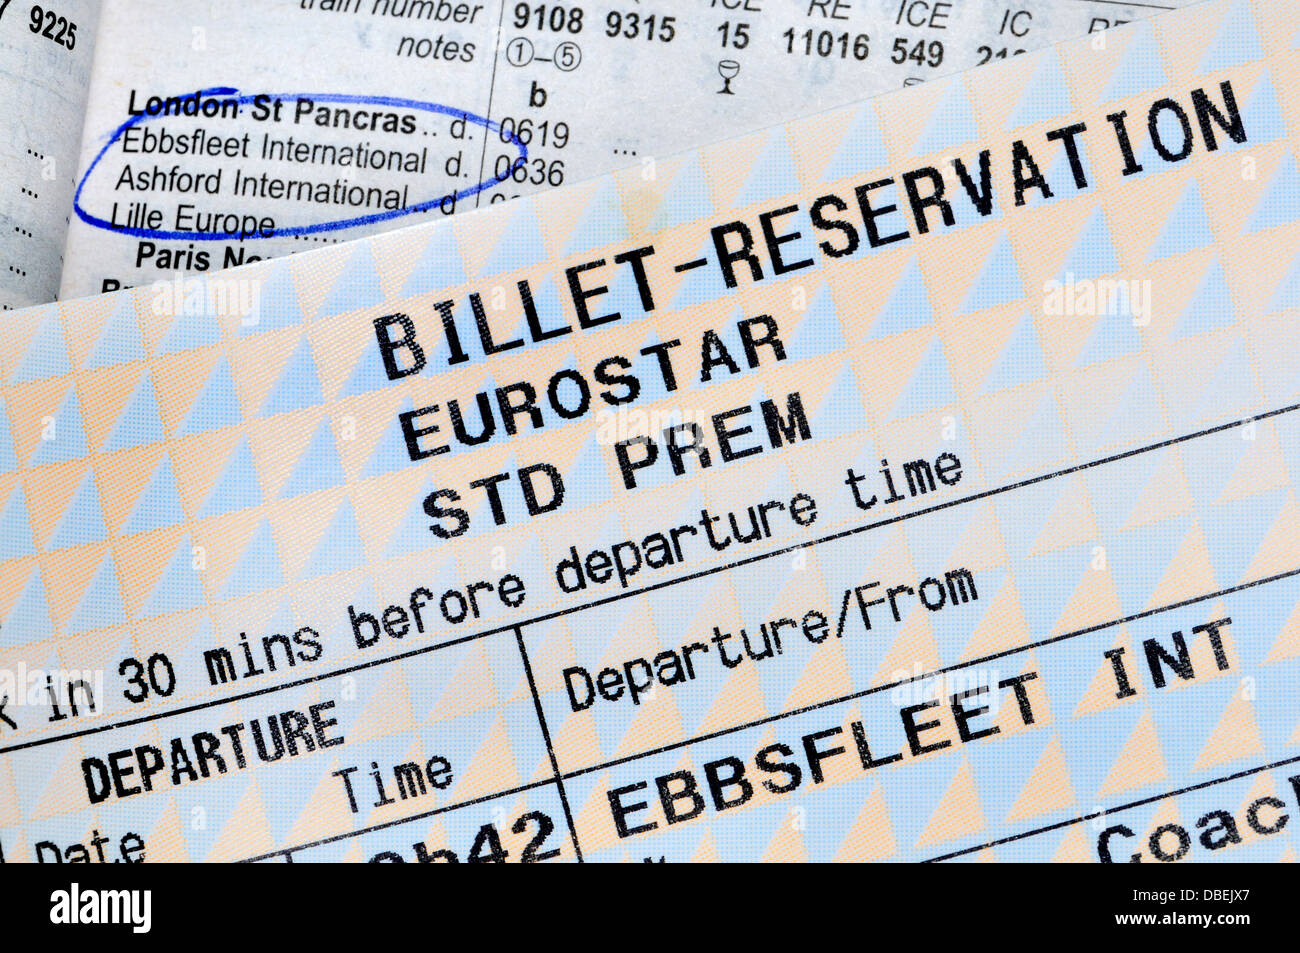 Rail Ticket and Timetable - Ebbsfleet International to Paris - Stock Image